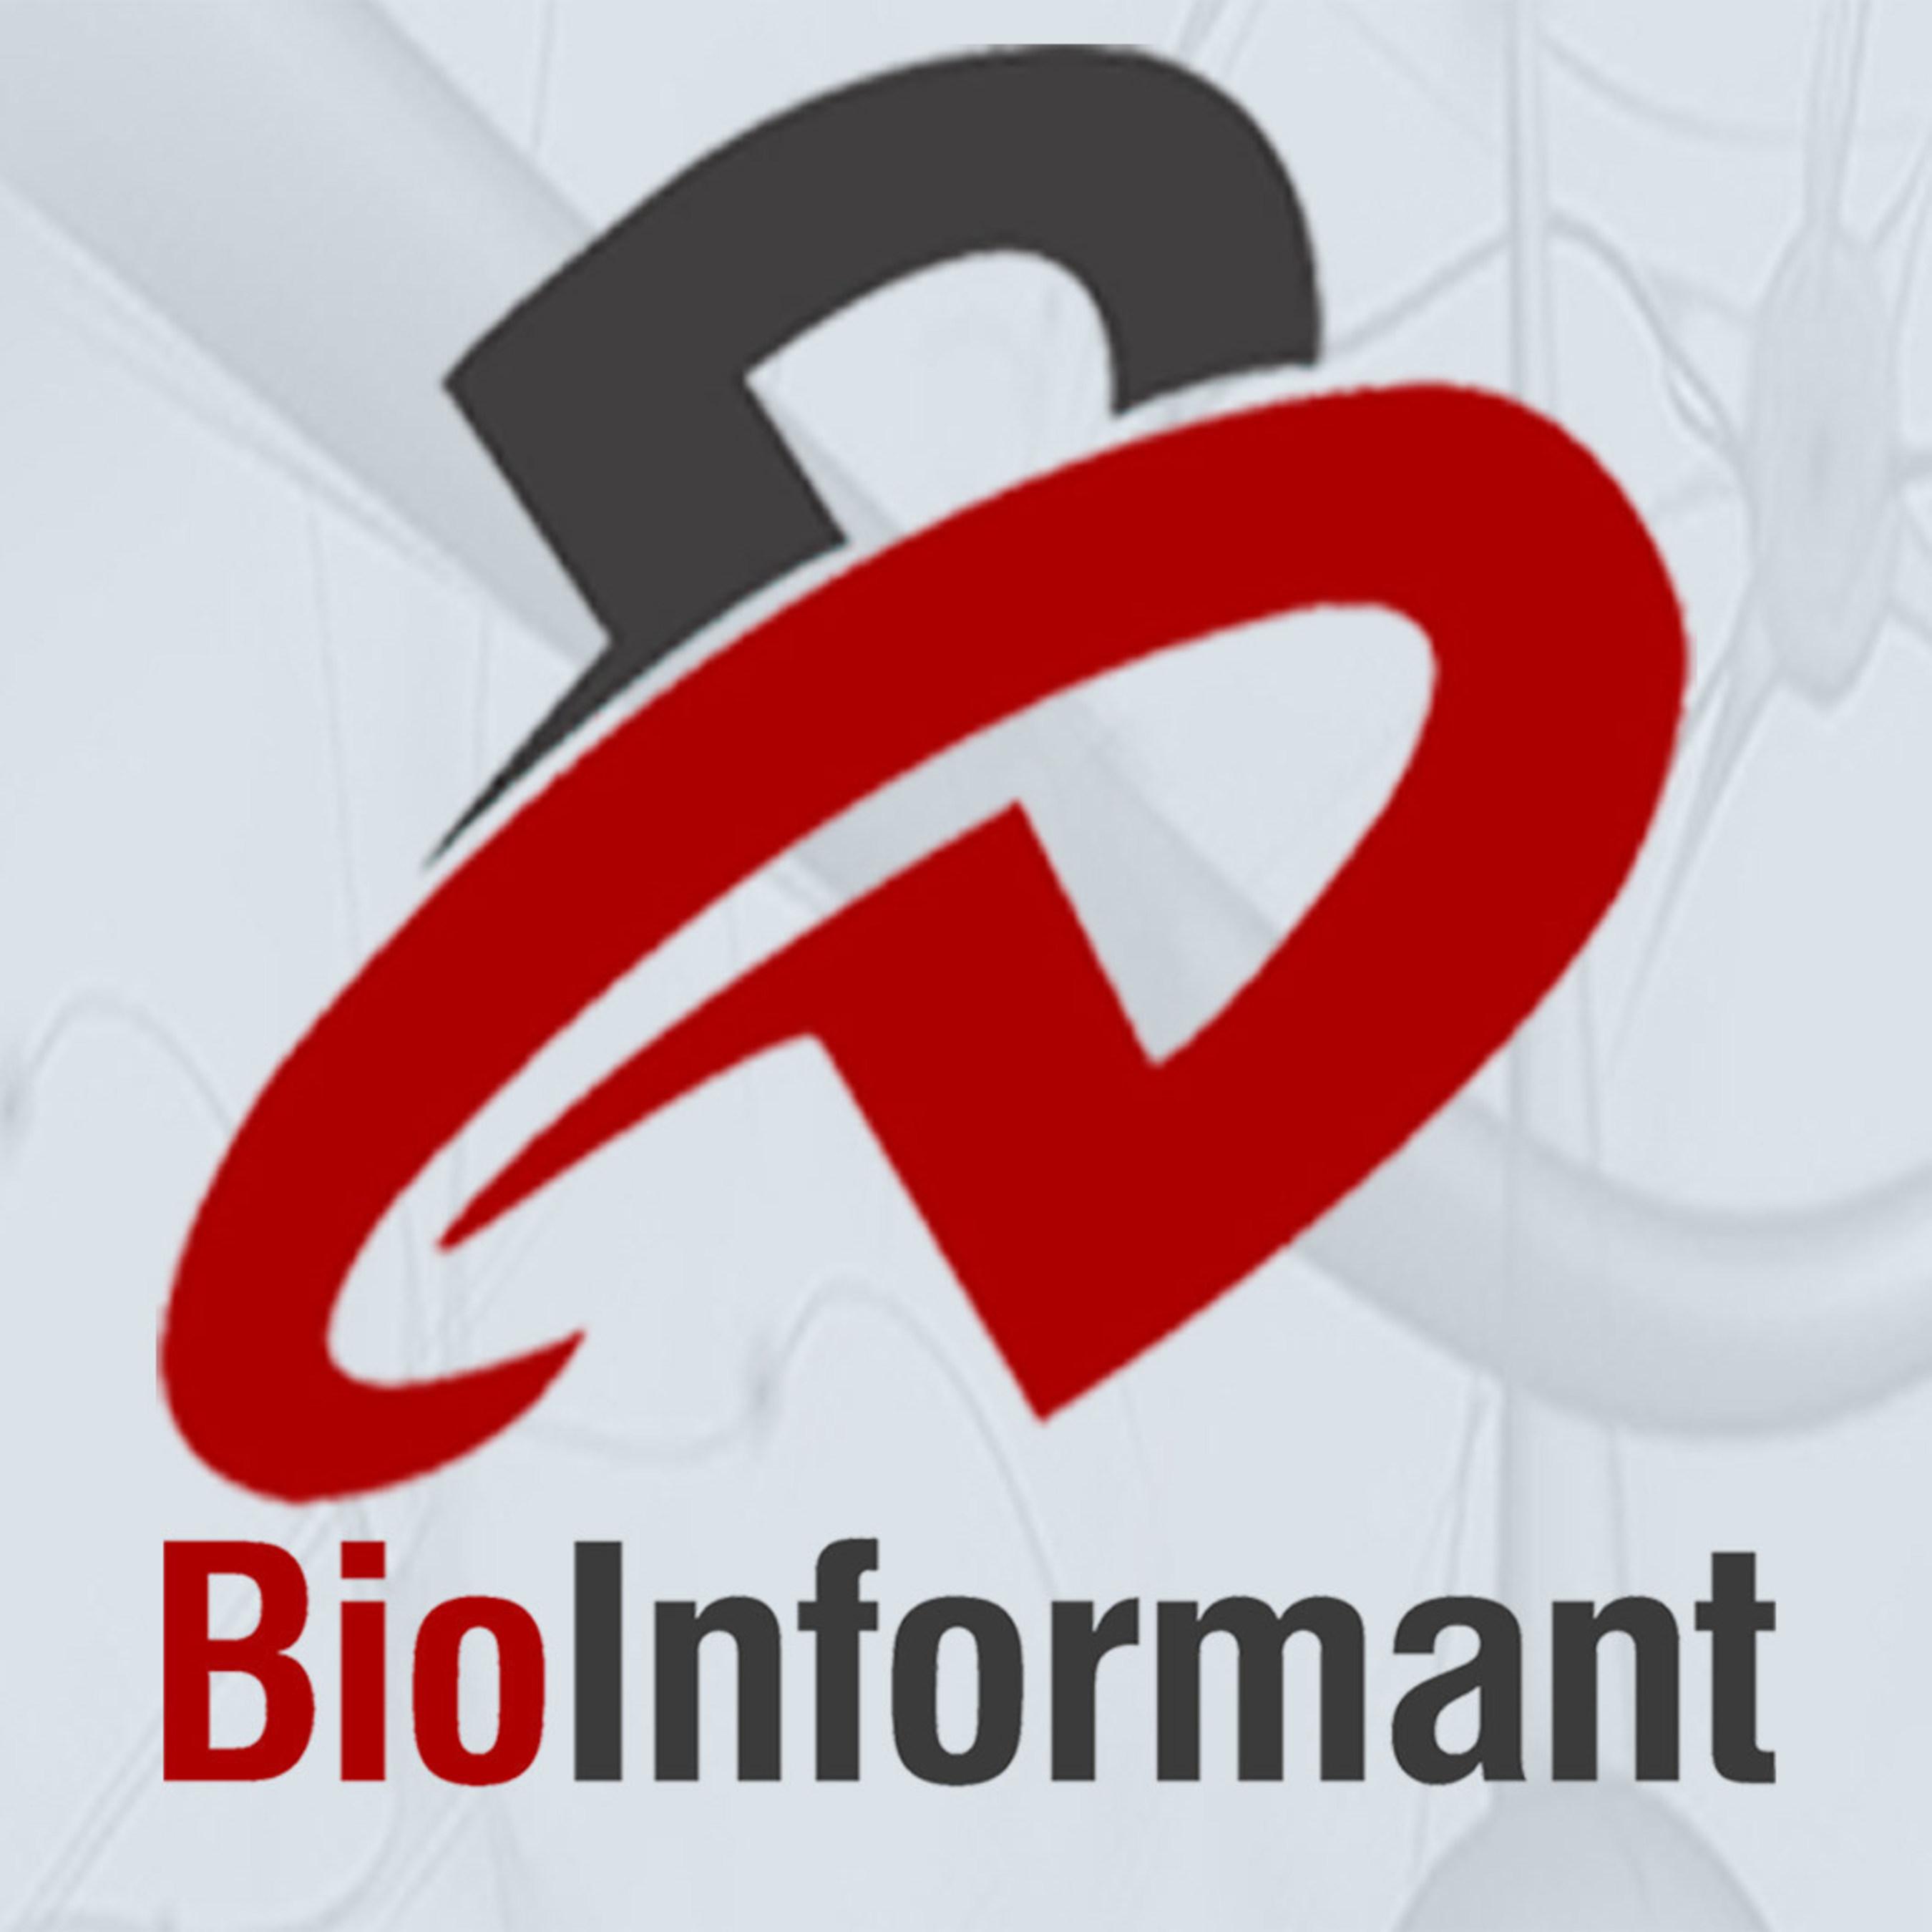 BioInformant Announces Sponsorship of 2015 World Stem Cell Summit, Shares Aligned Mission for Stem